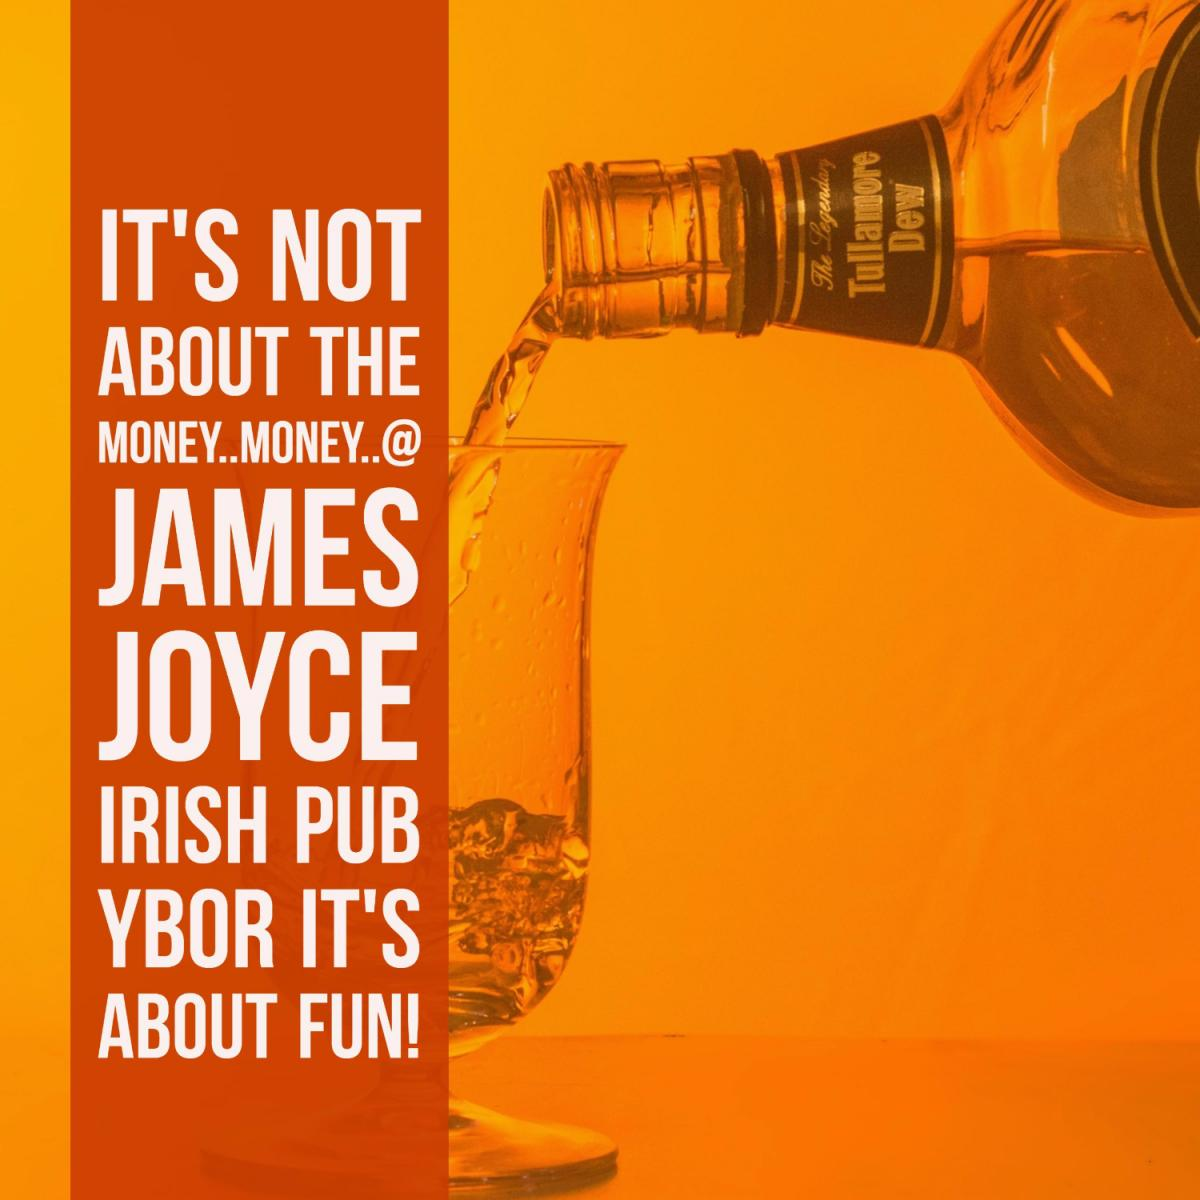 Get Your Jollies with James Joyce Irish Pub in Ybor